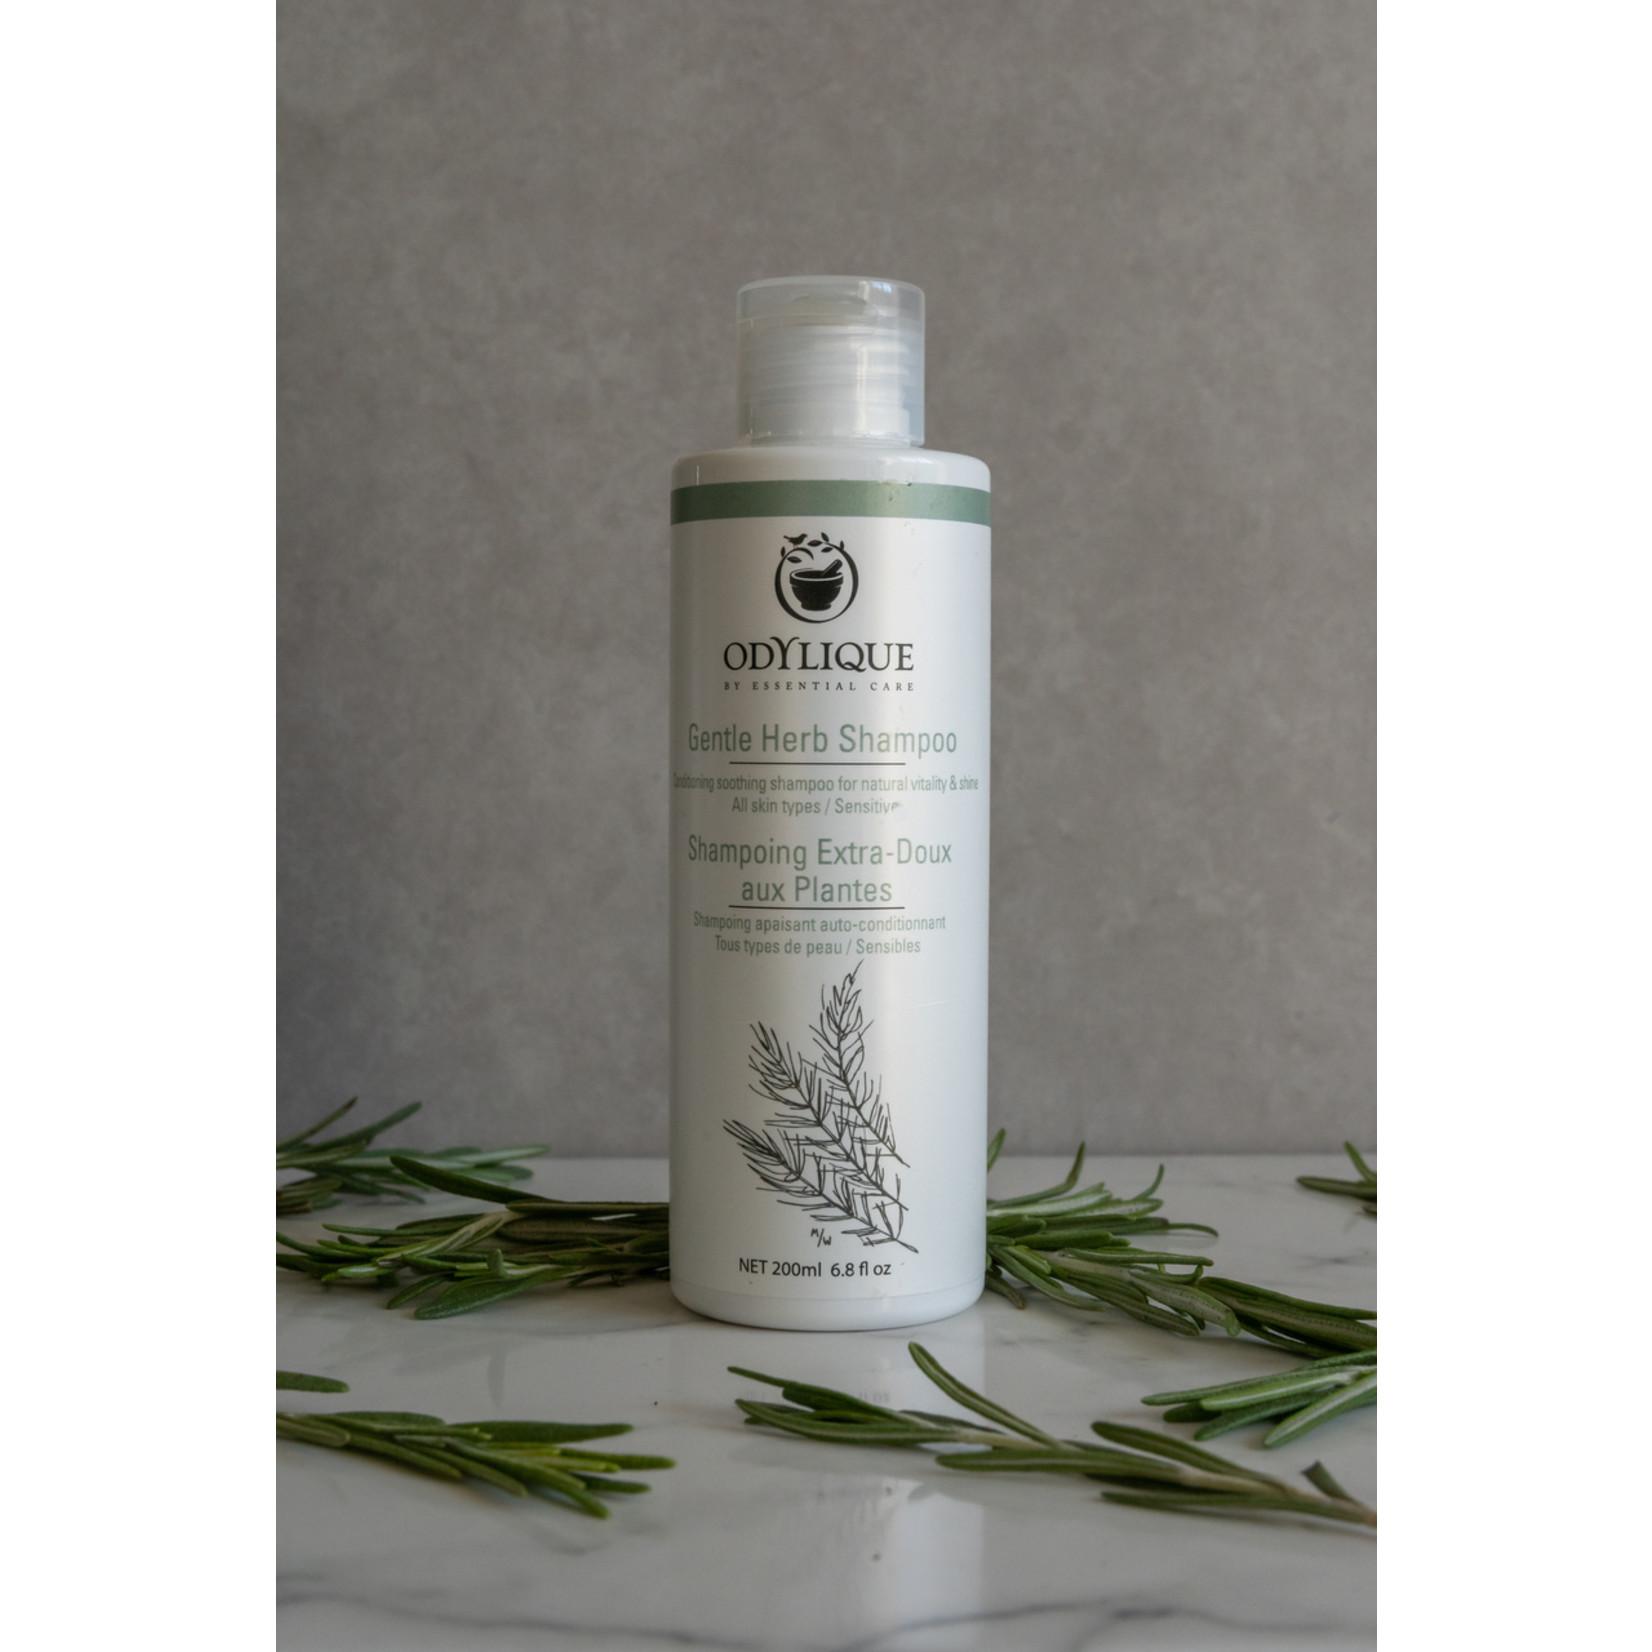 Odylique Gentle herb shampoo Odylique - award winnaar!